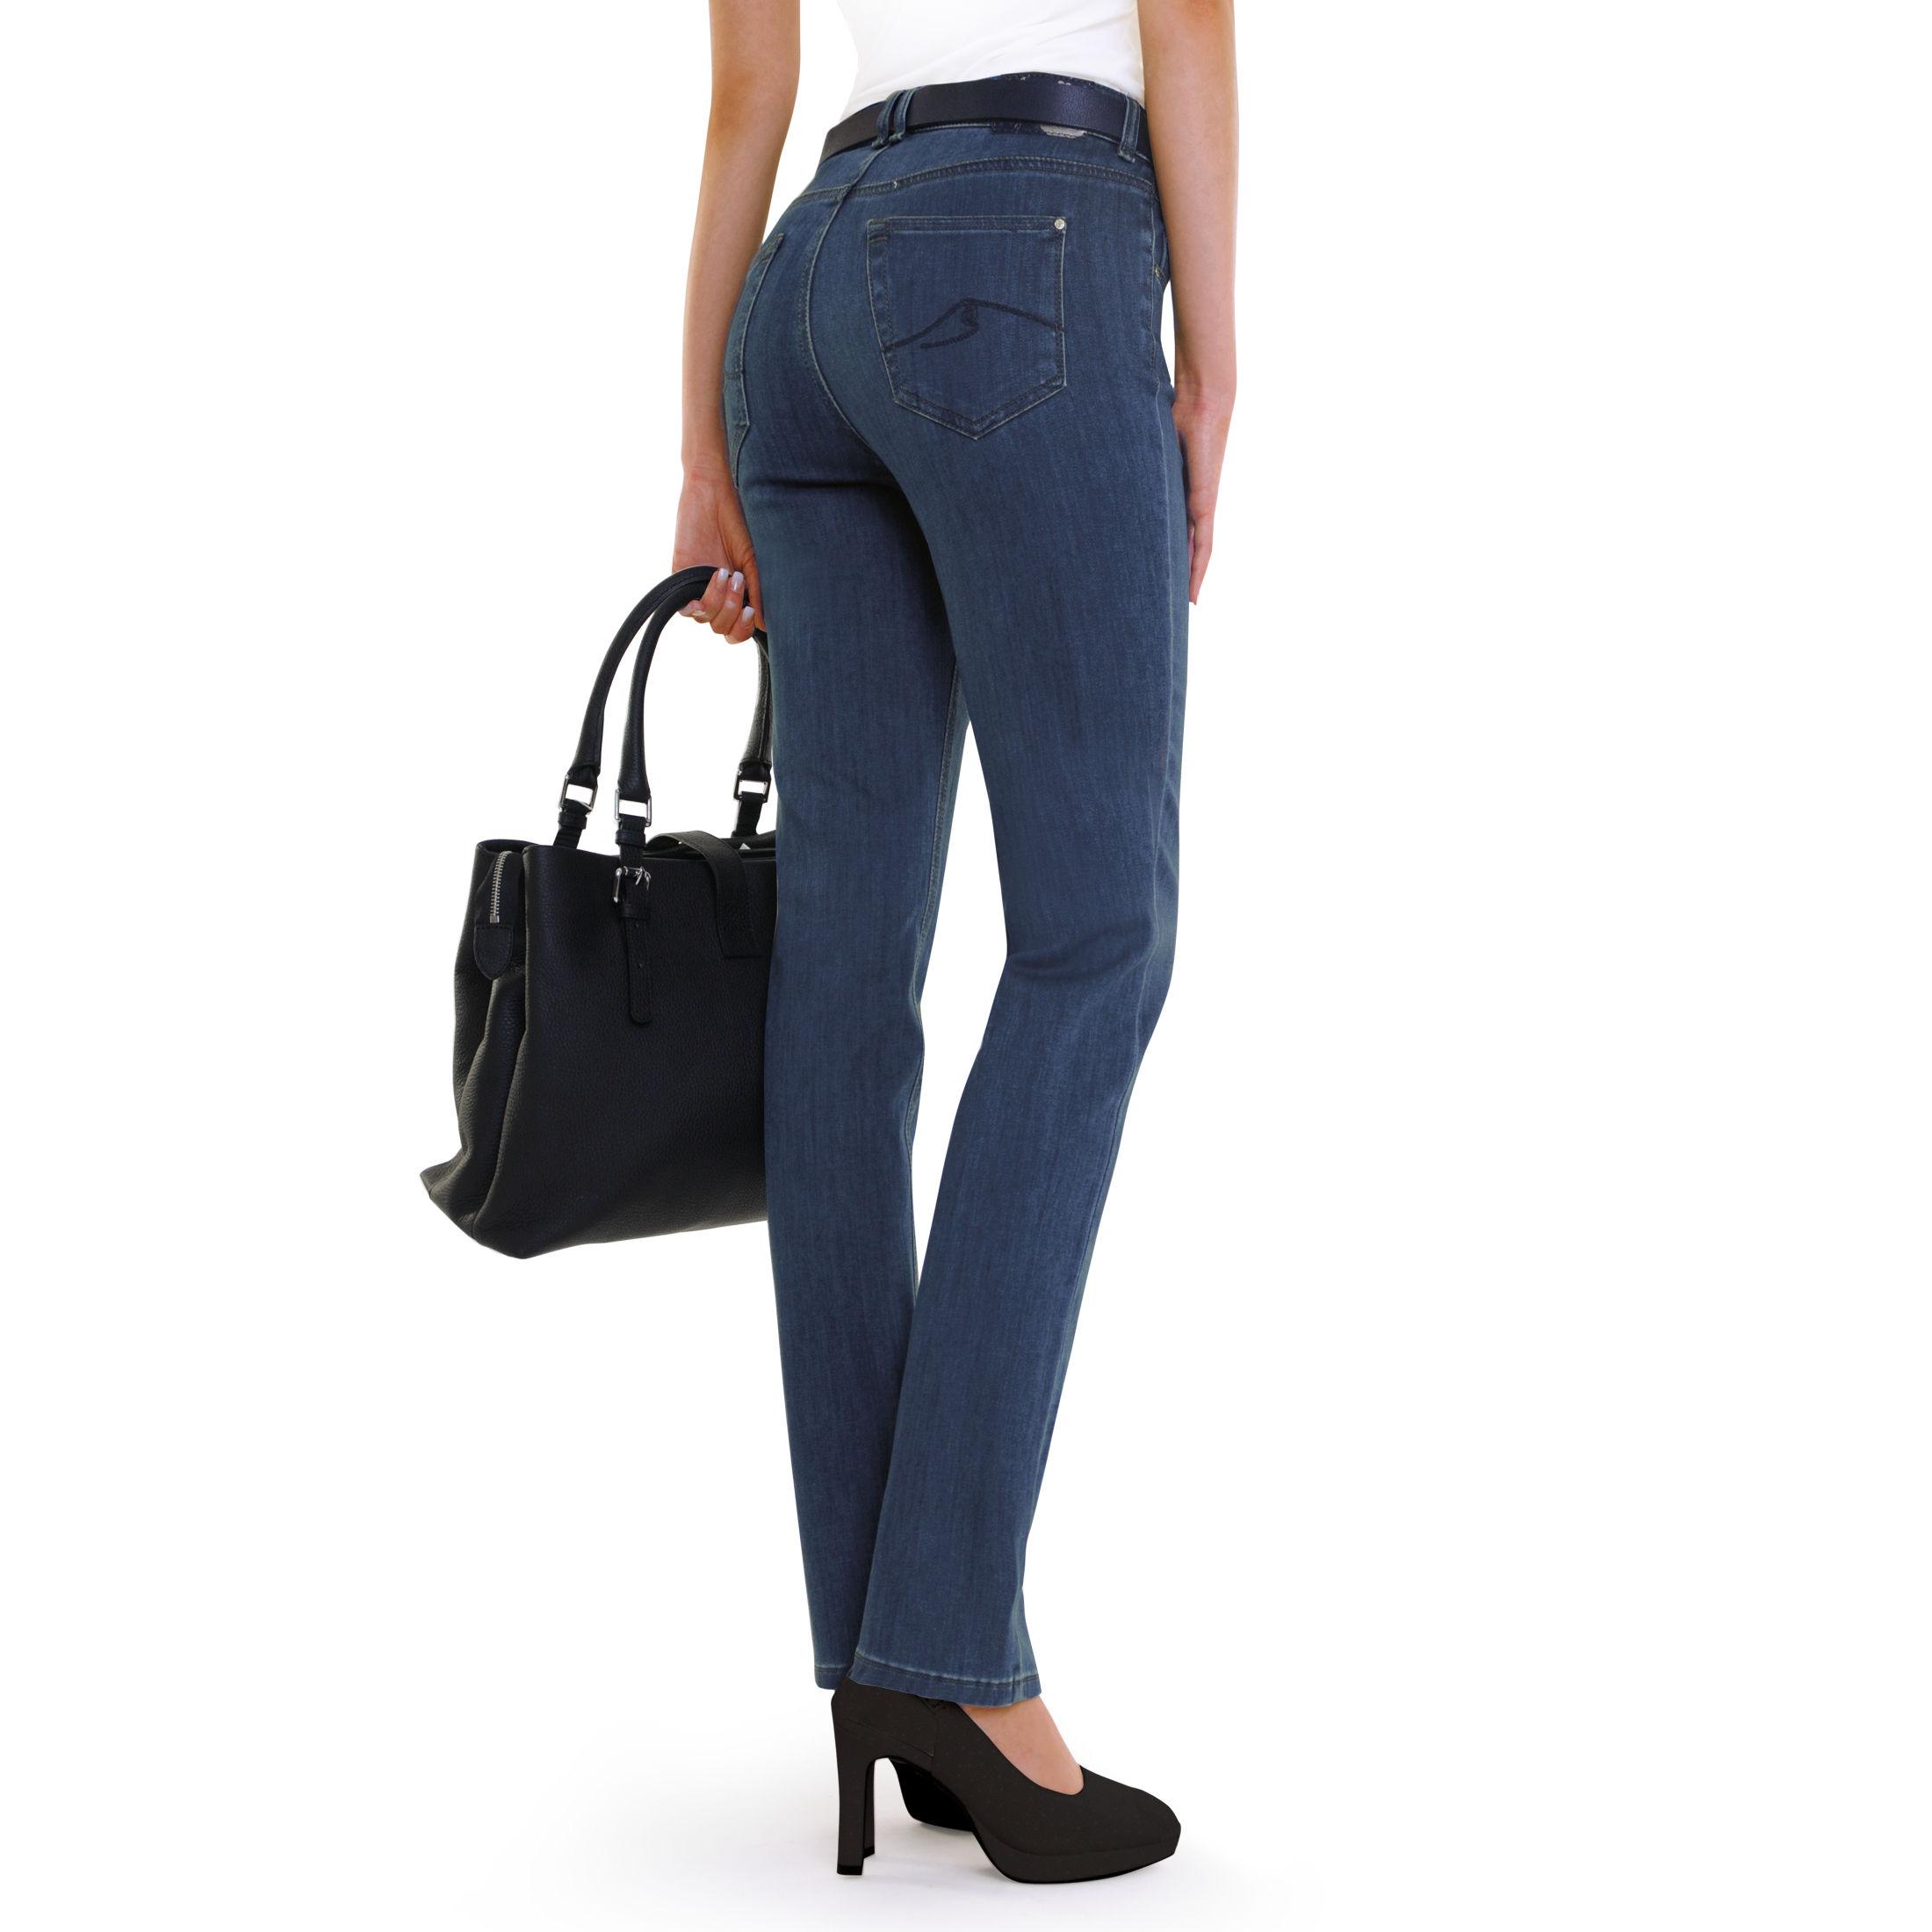 Jeans-ZURI-blau-Gr-36-61854-911-FB168-GR-36